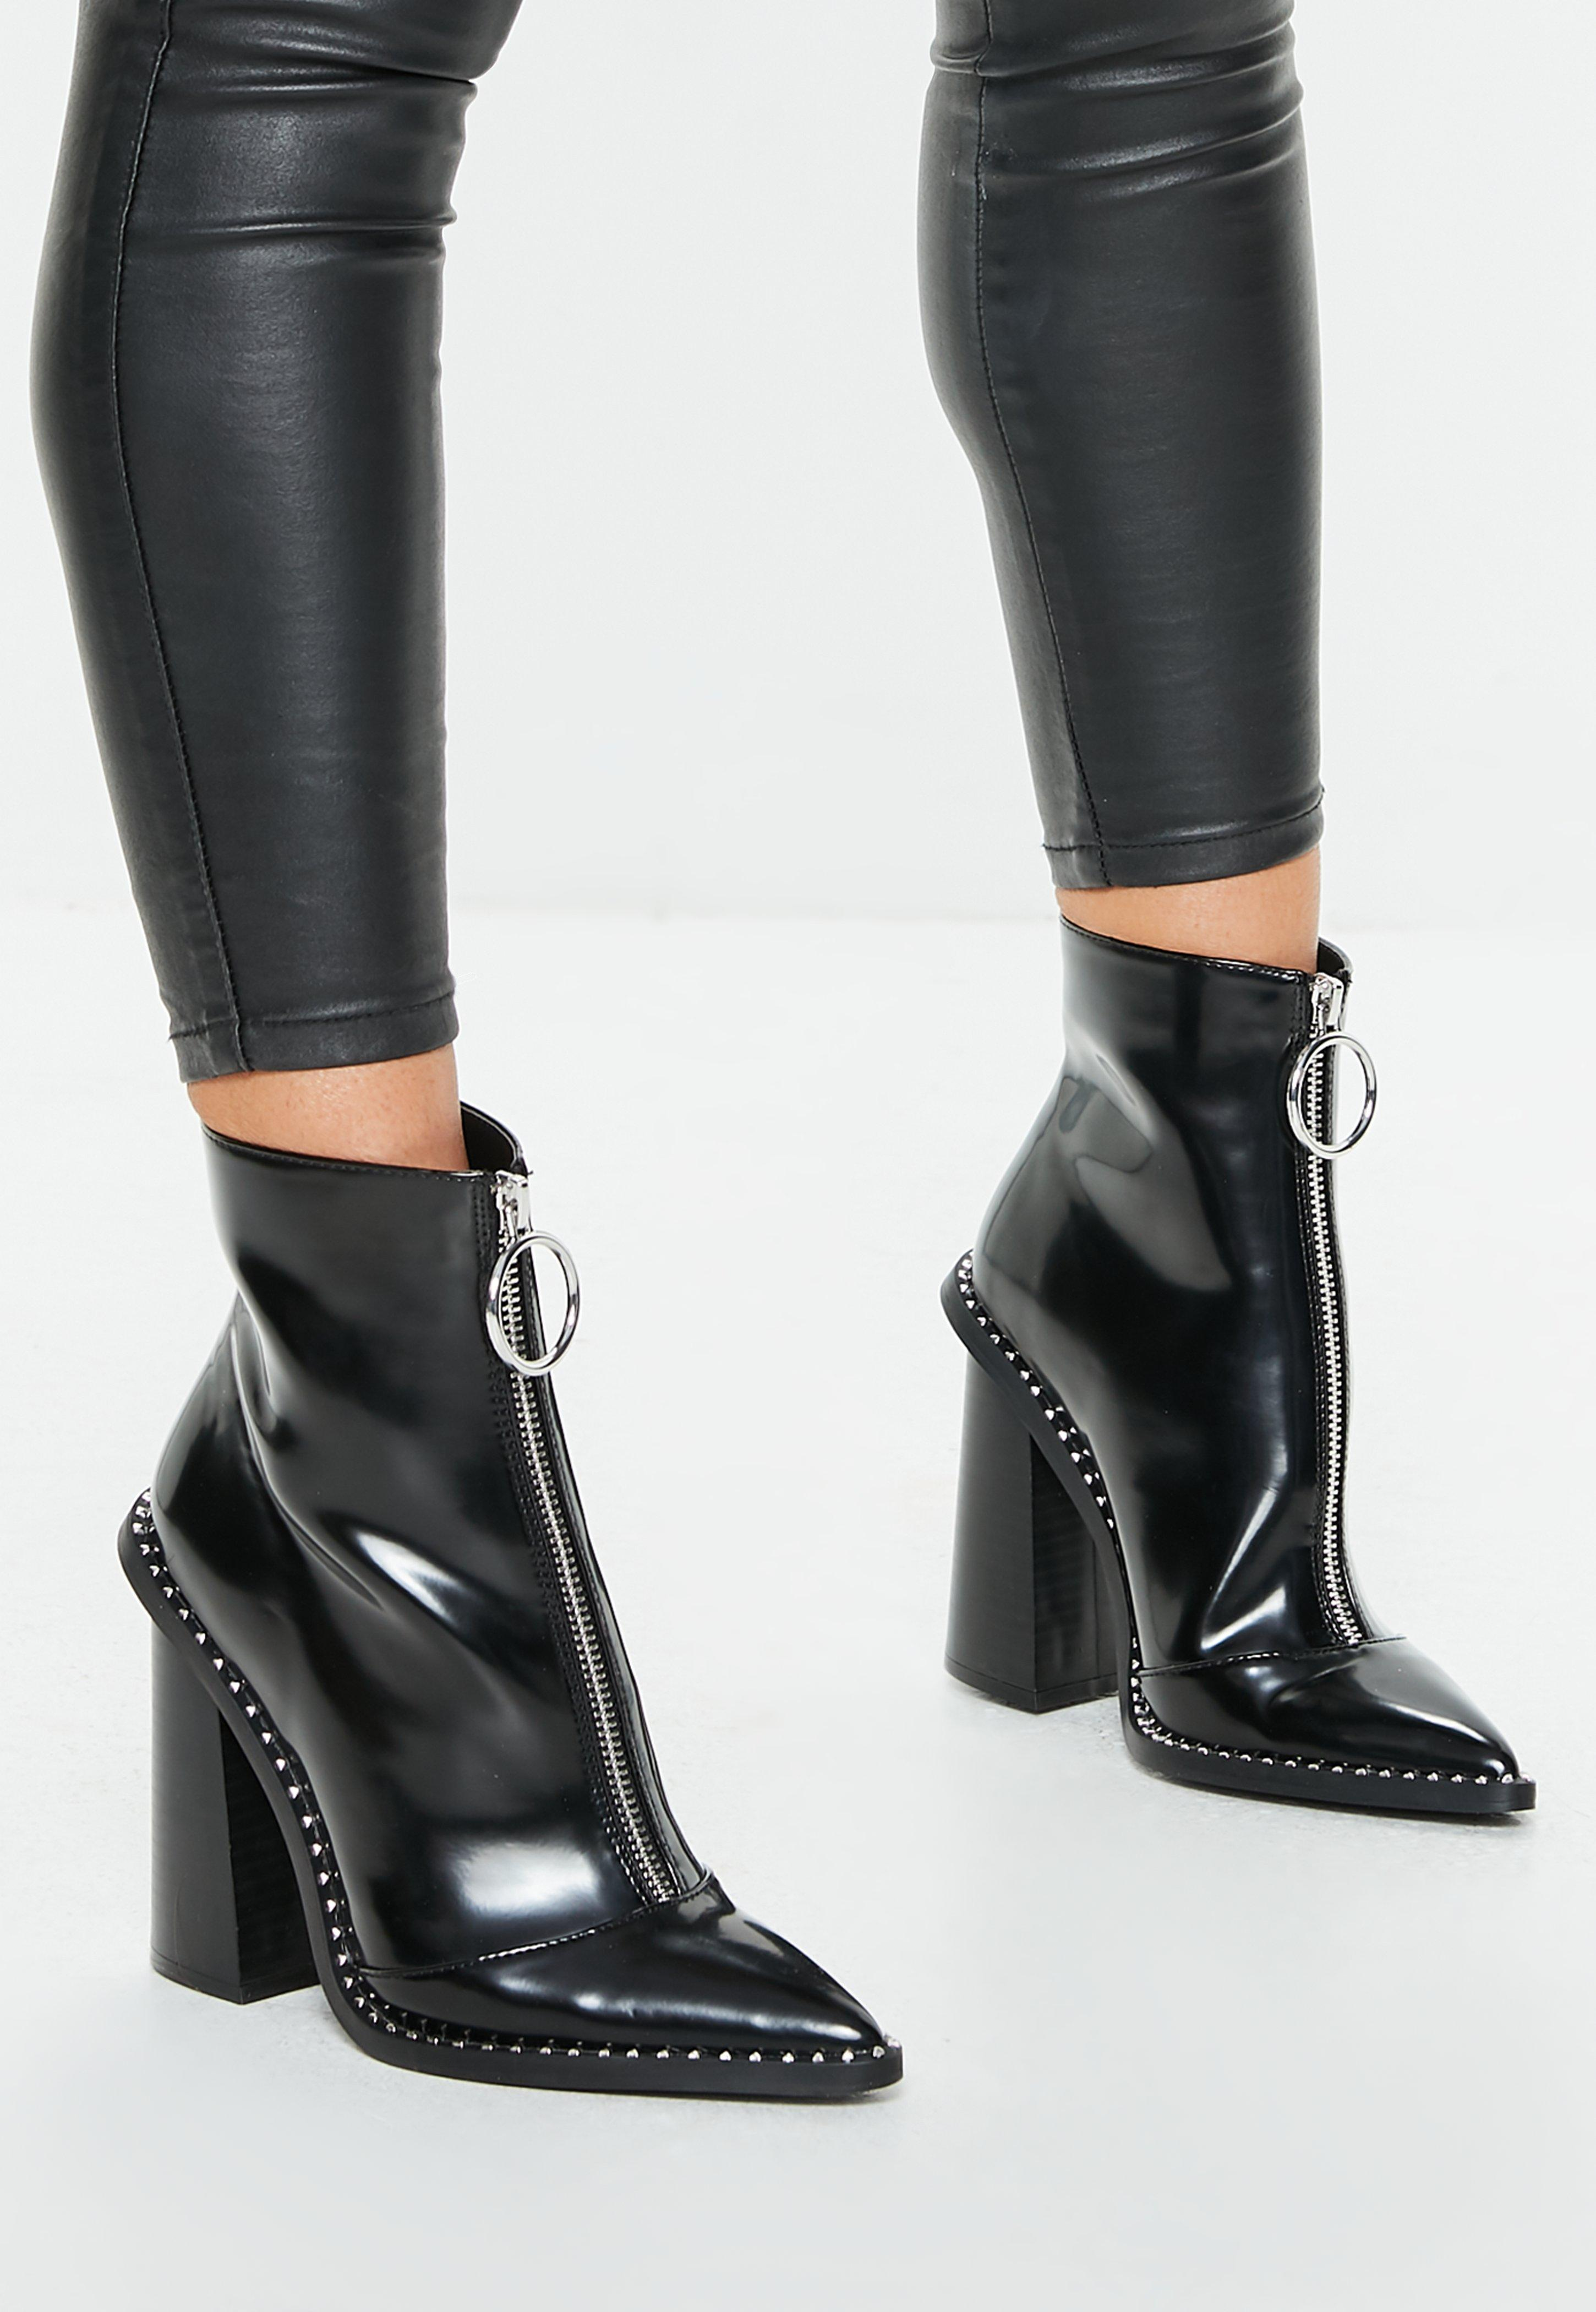 Ligne Chaussure Achat Femme Chaussures Missguided En AxwUzYqw